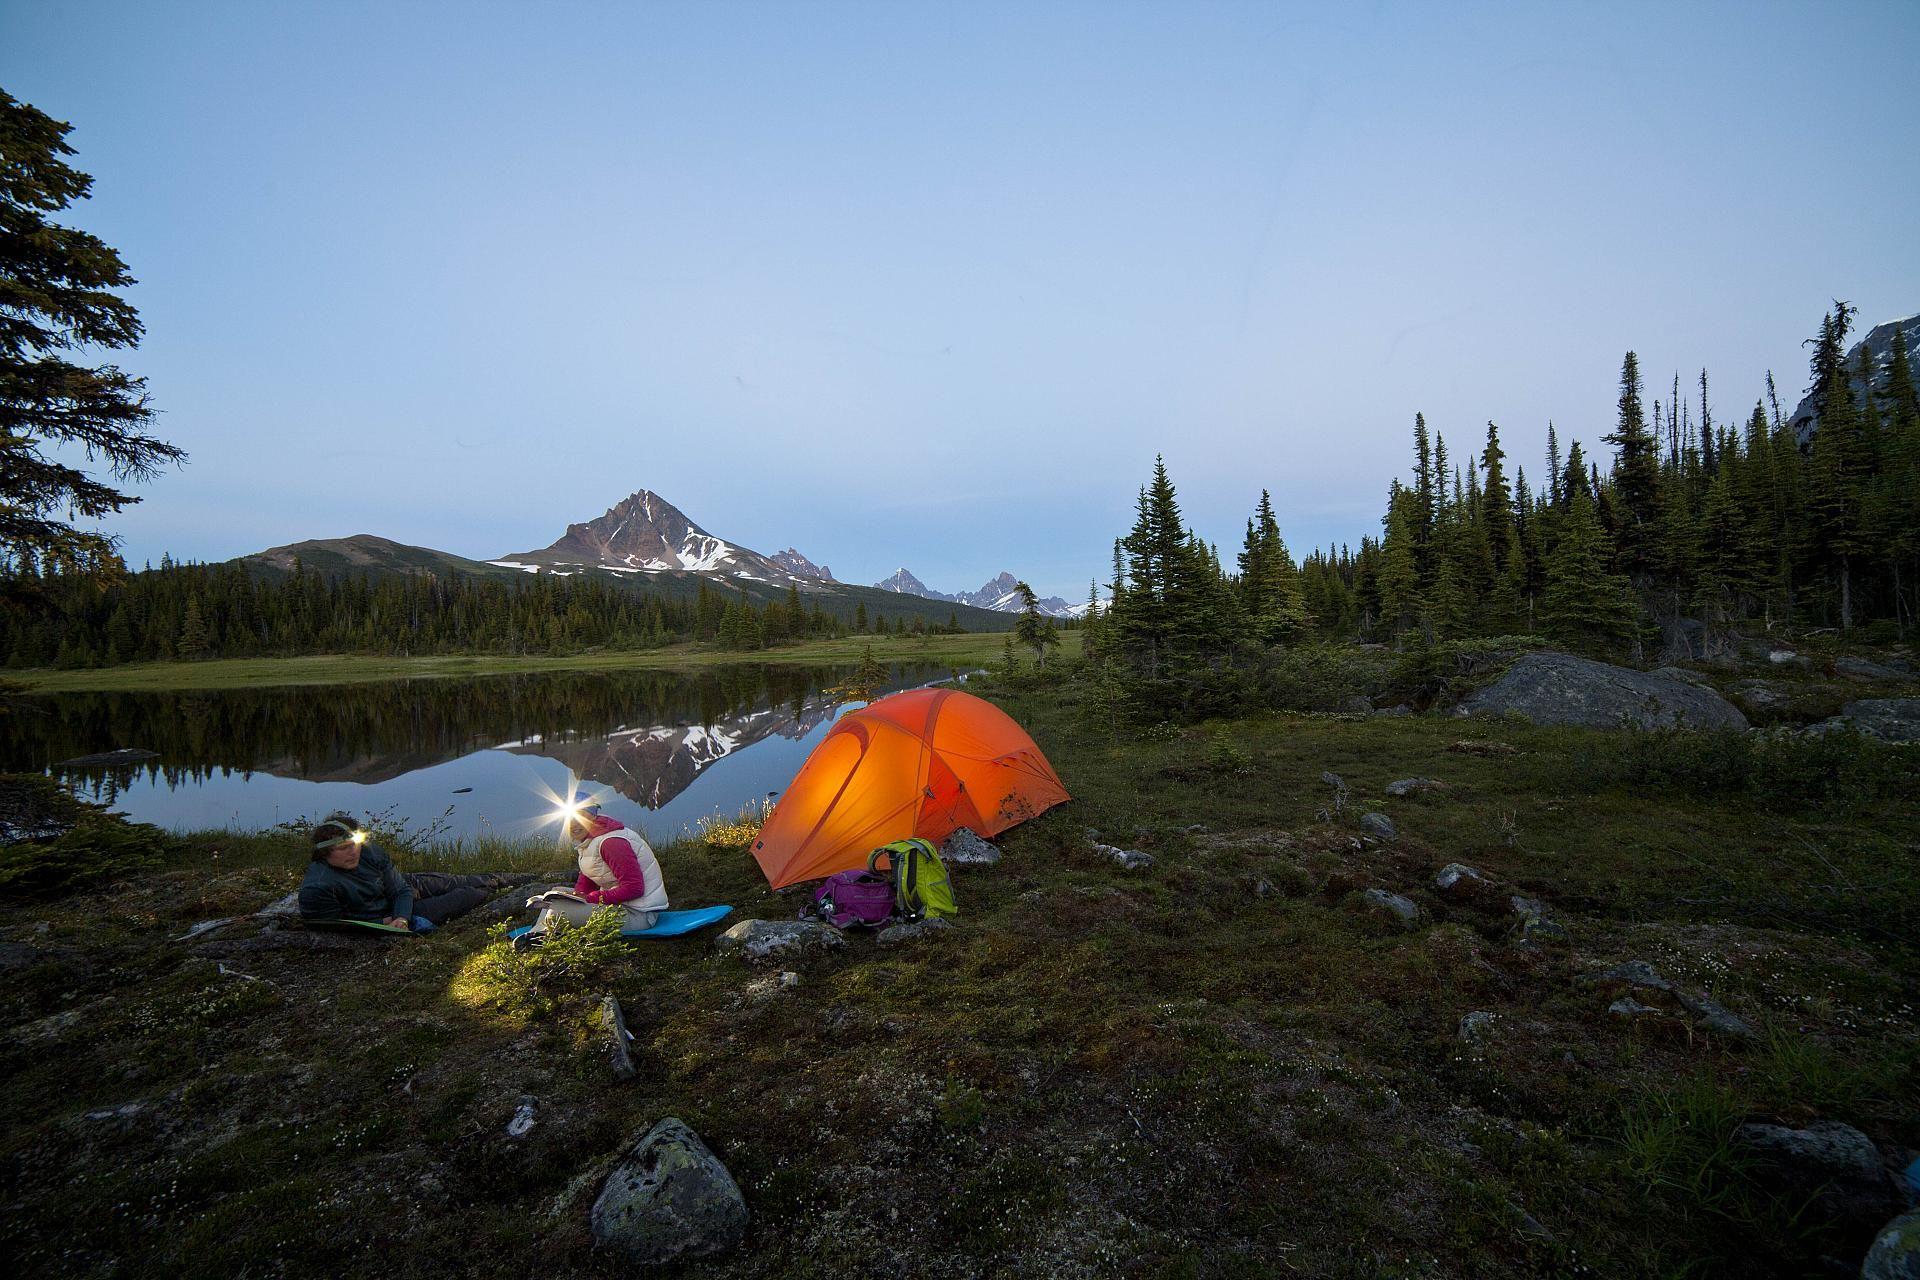 camping places campsites canada camp go mag explore hiking